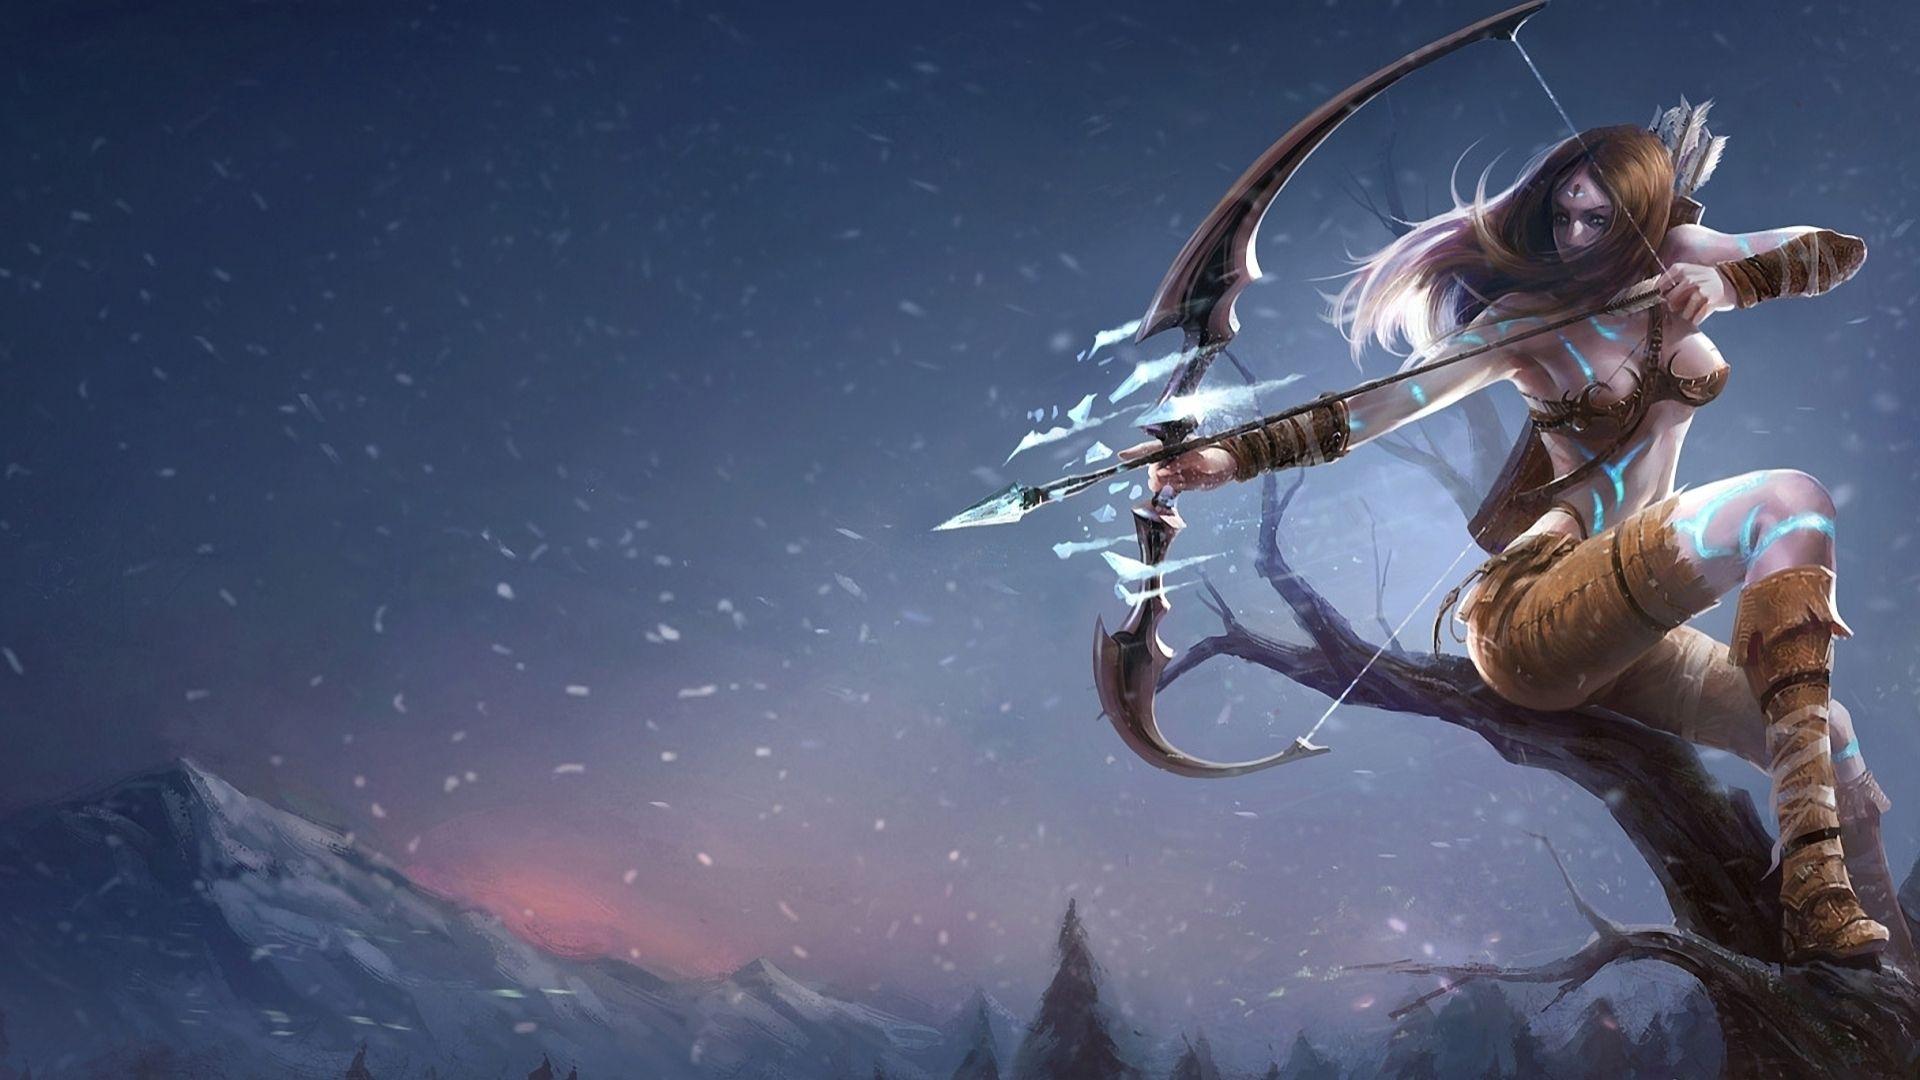 League Of Legends Fantasy Art Women Girl Warrior Weapons Archer Bow